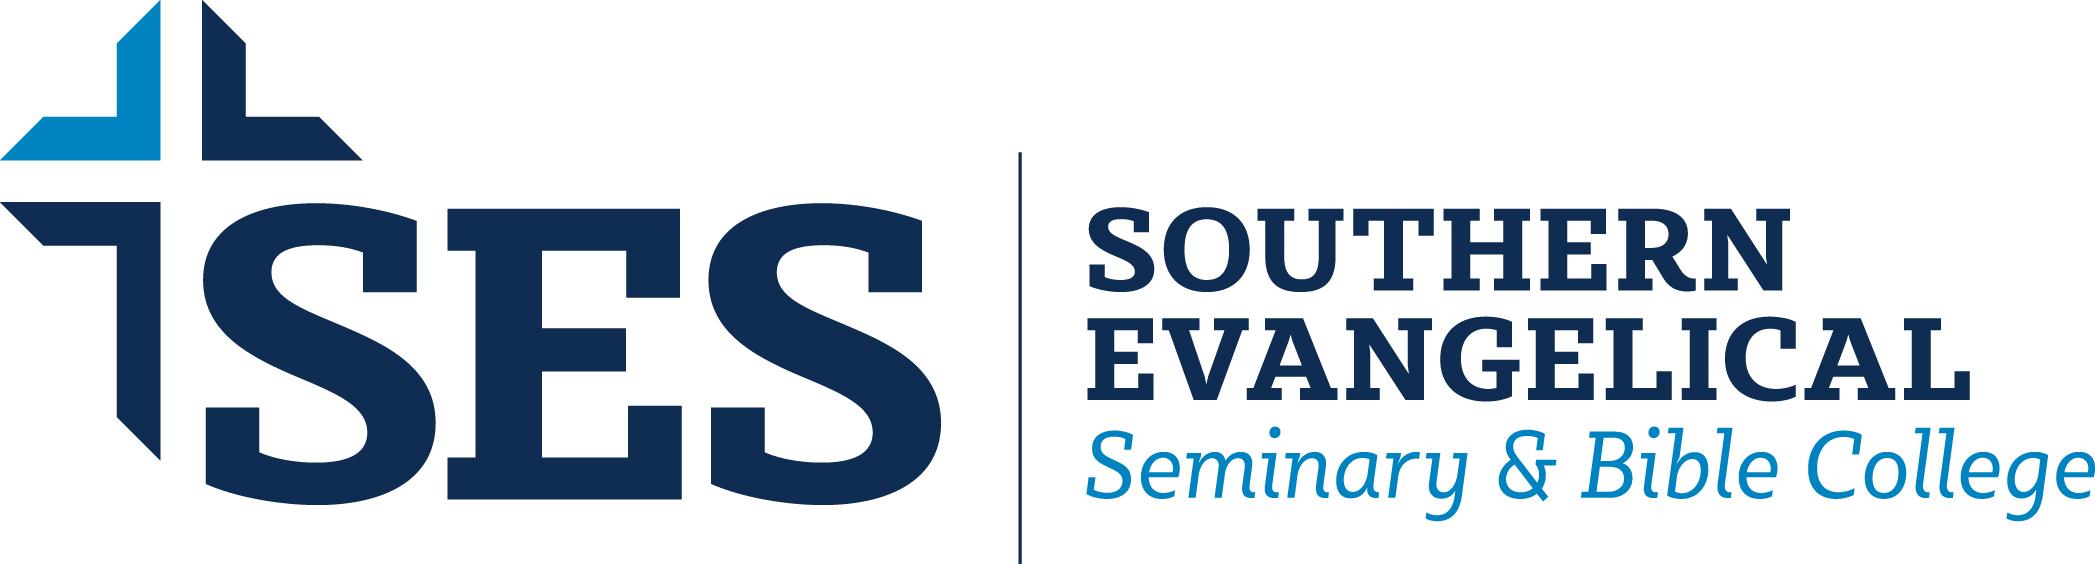 SES 2015 logo FINAL (process blue)_RGB.jpg